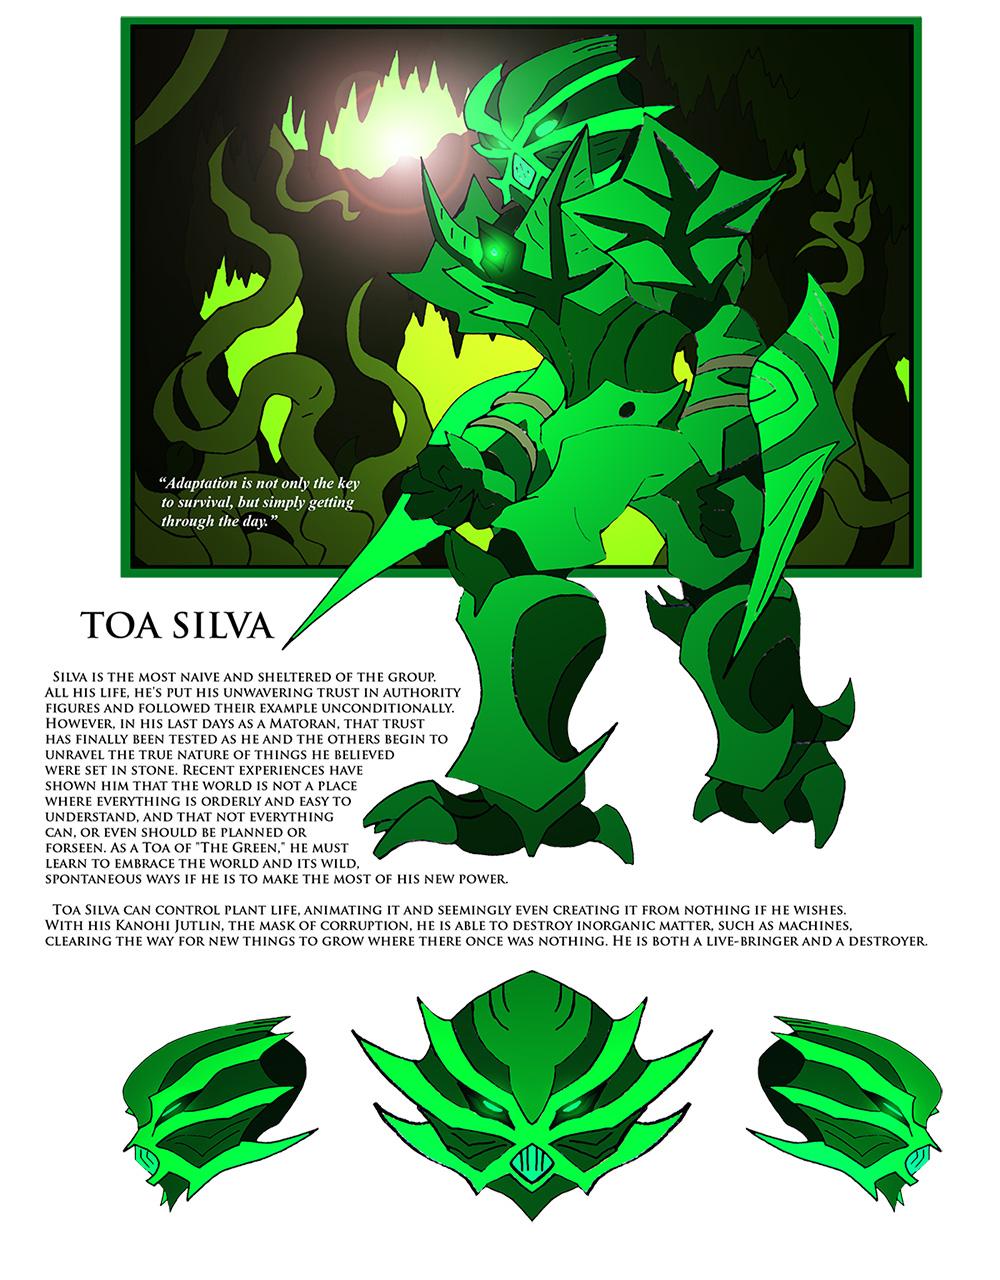 toa_silva_bio_complete__by_nickinamerica